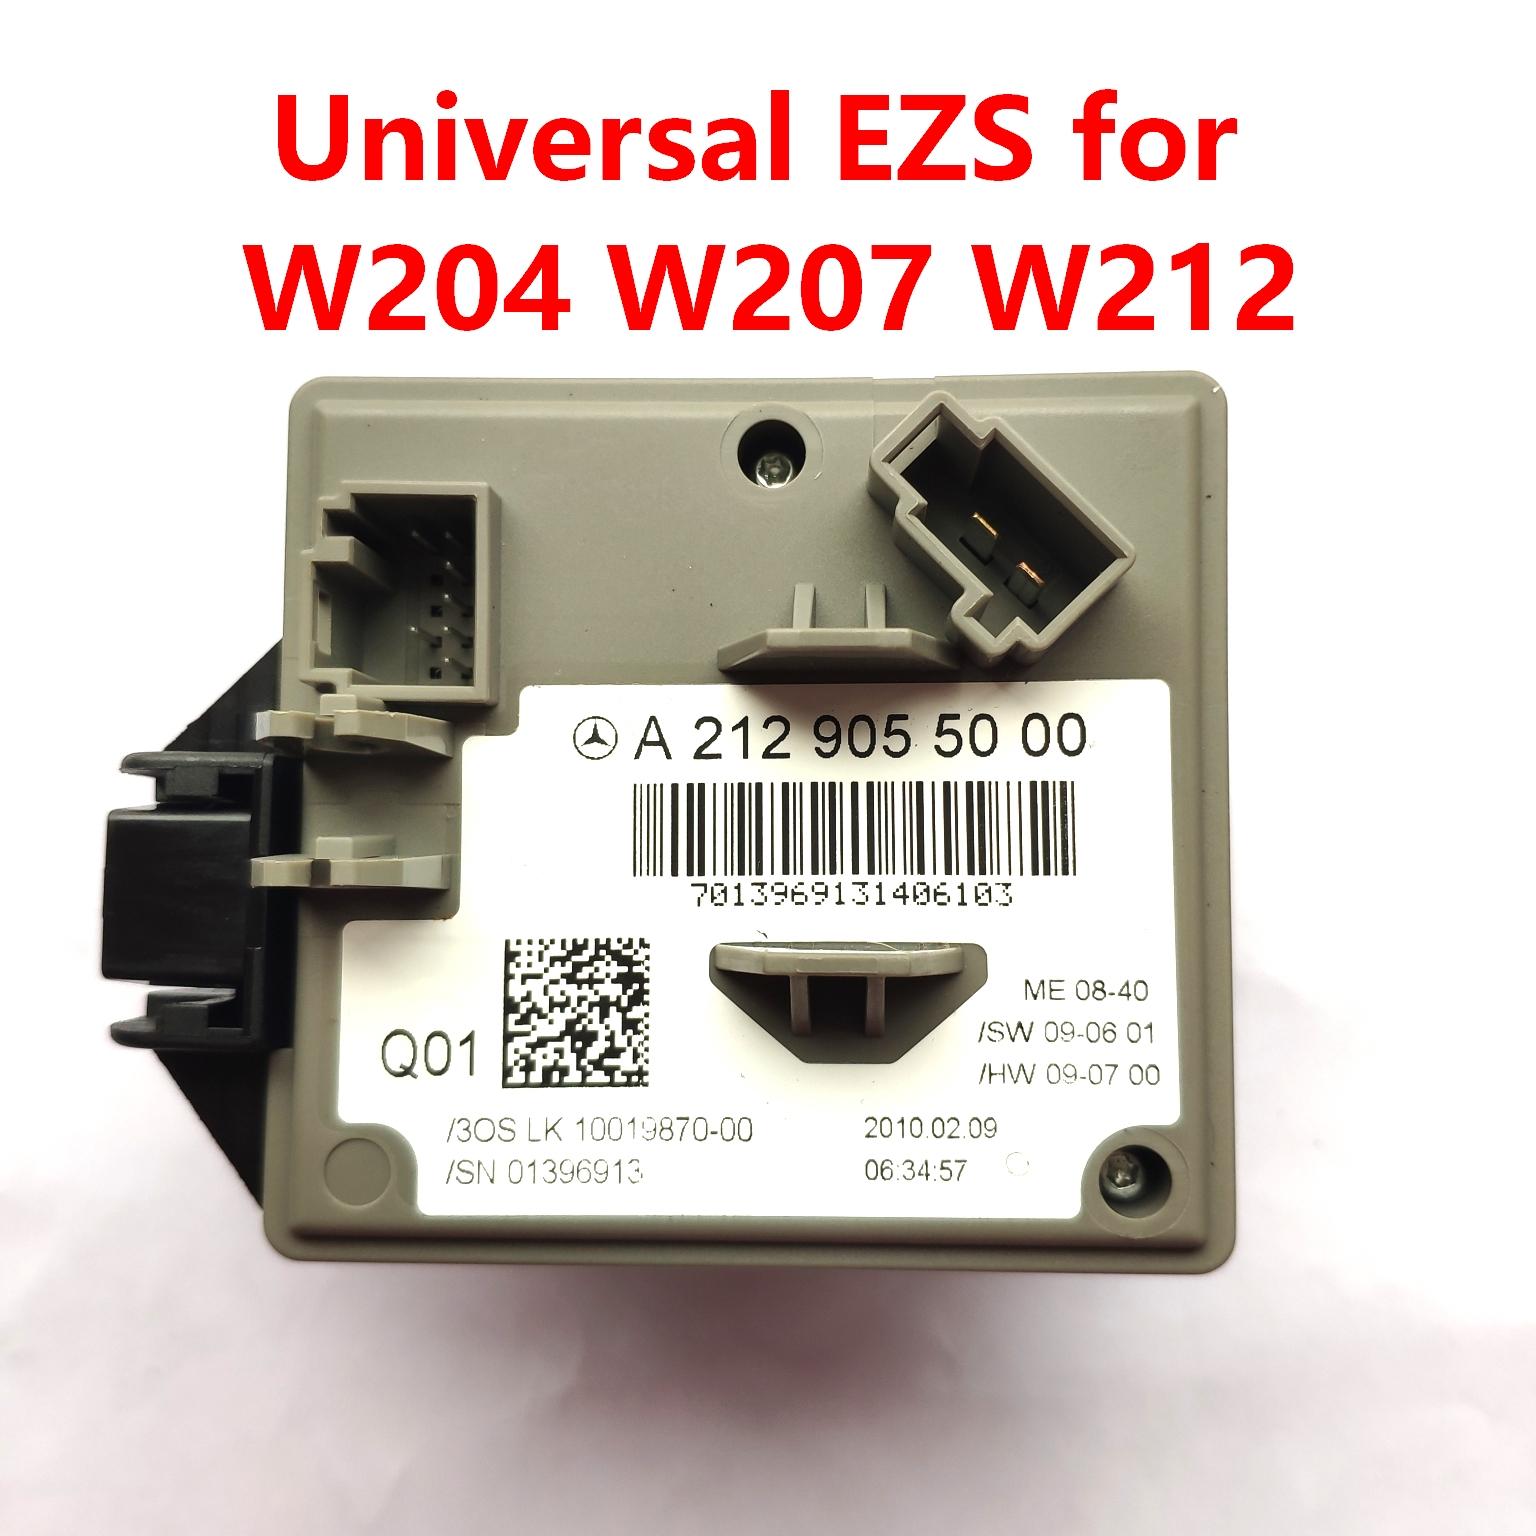 Universal EZS for Mercedes Benz W204 W207 W212 - 100% New & Original